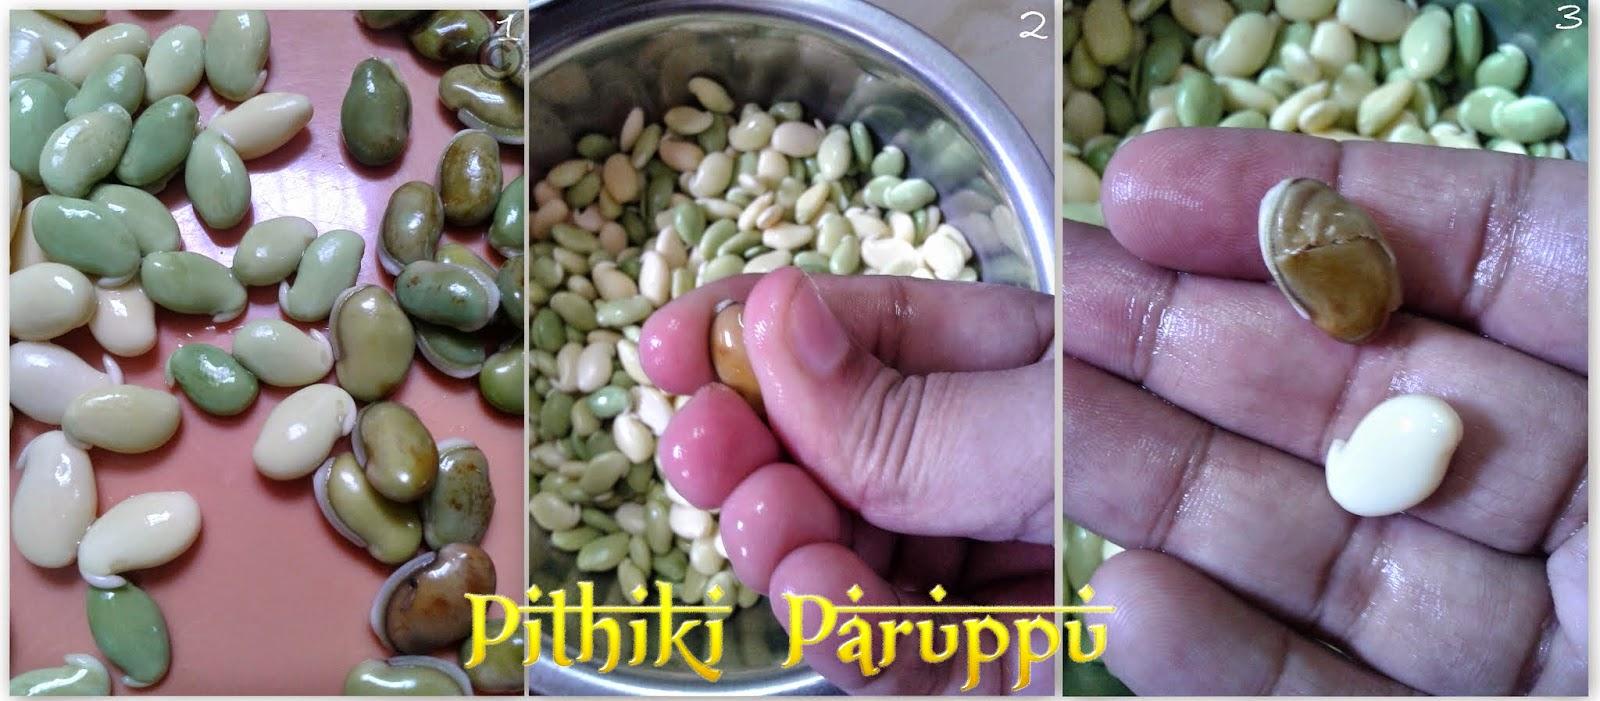 Pithiki-Paruppu